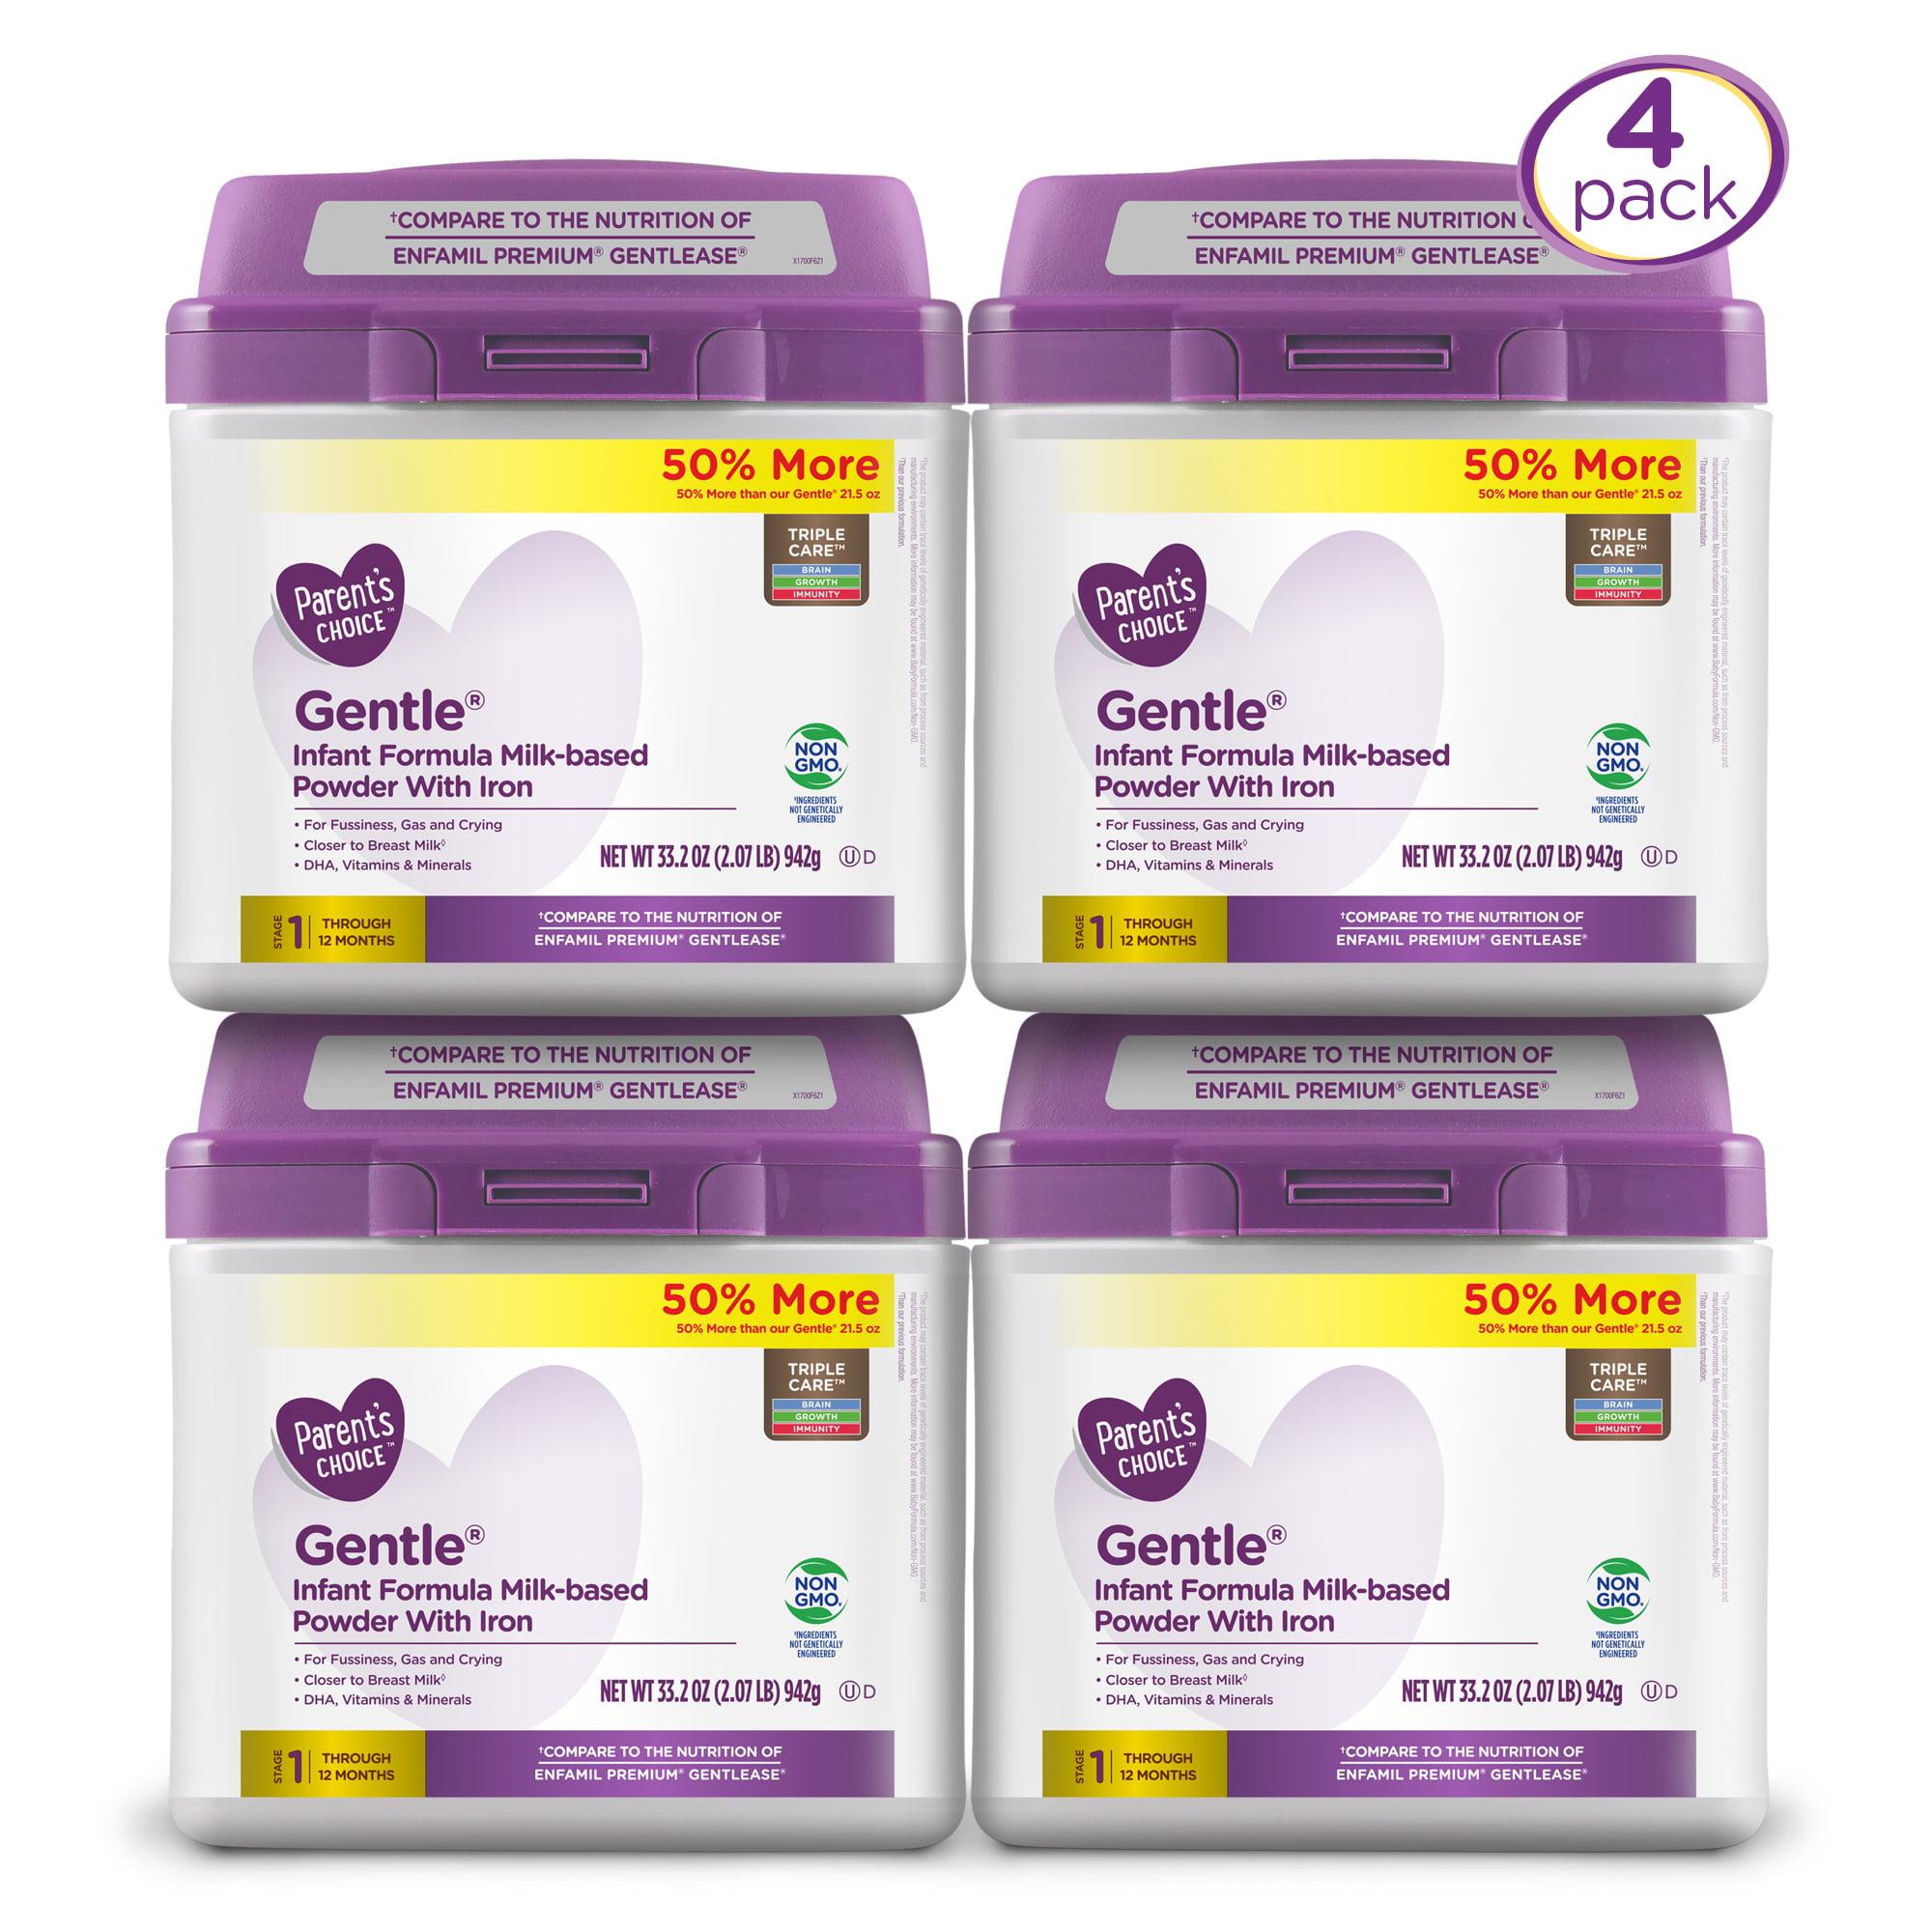 Parent's Choice Non-GMO Premium Gentle Infant Formula with Iron, 4 Pack, 33.2 oz each